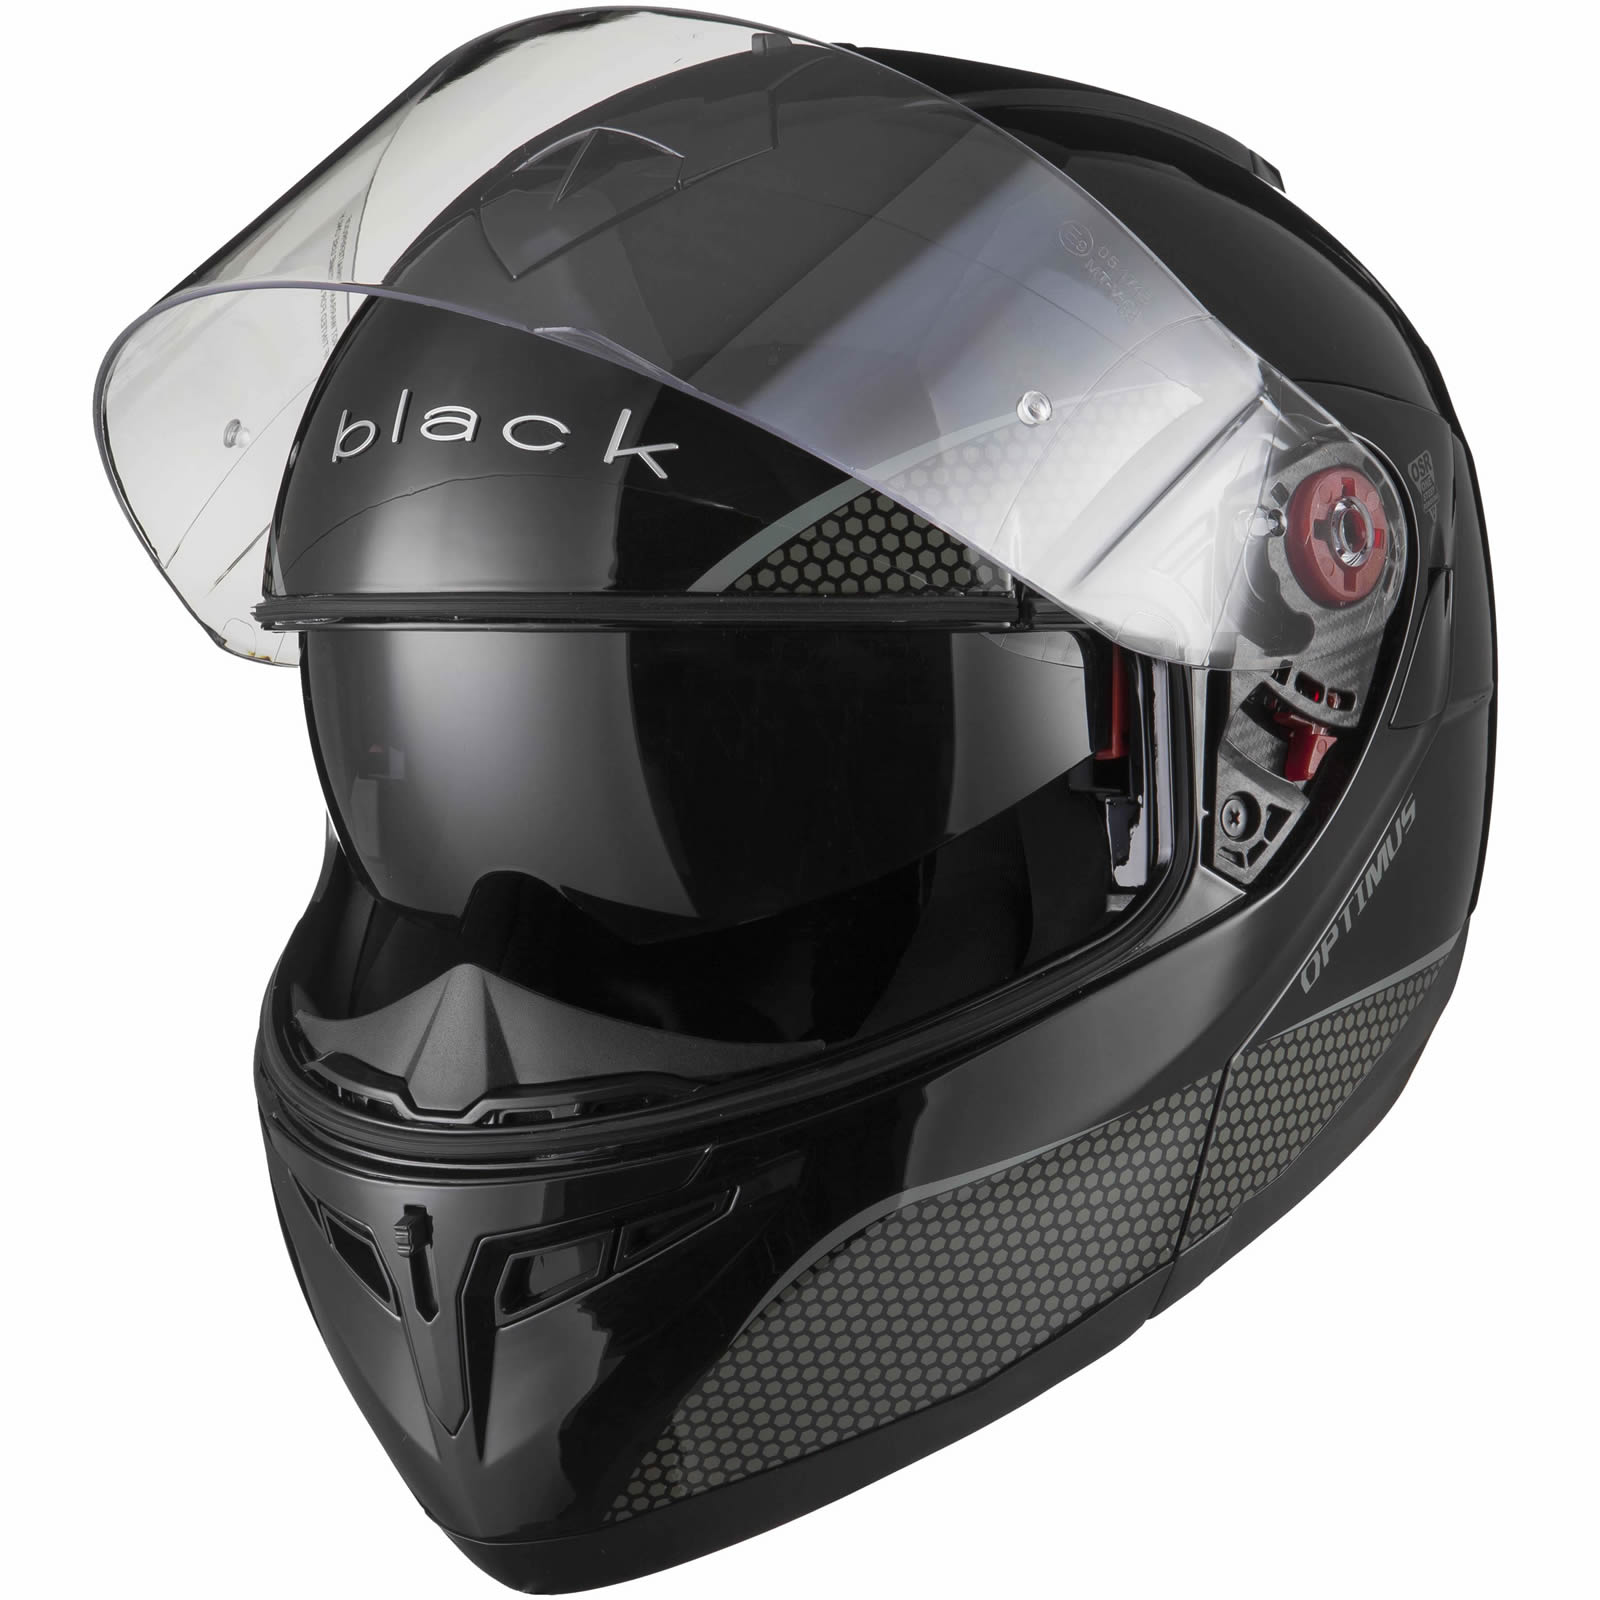 Black-Optimus-SV-Max-Vision-Flip-Up-Front-Motorcycle-Helmet-Pinlock-Ready-Visor thumbnail 14